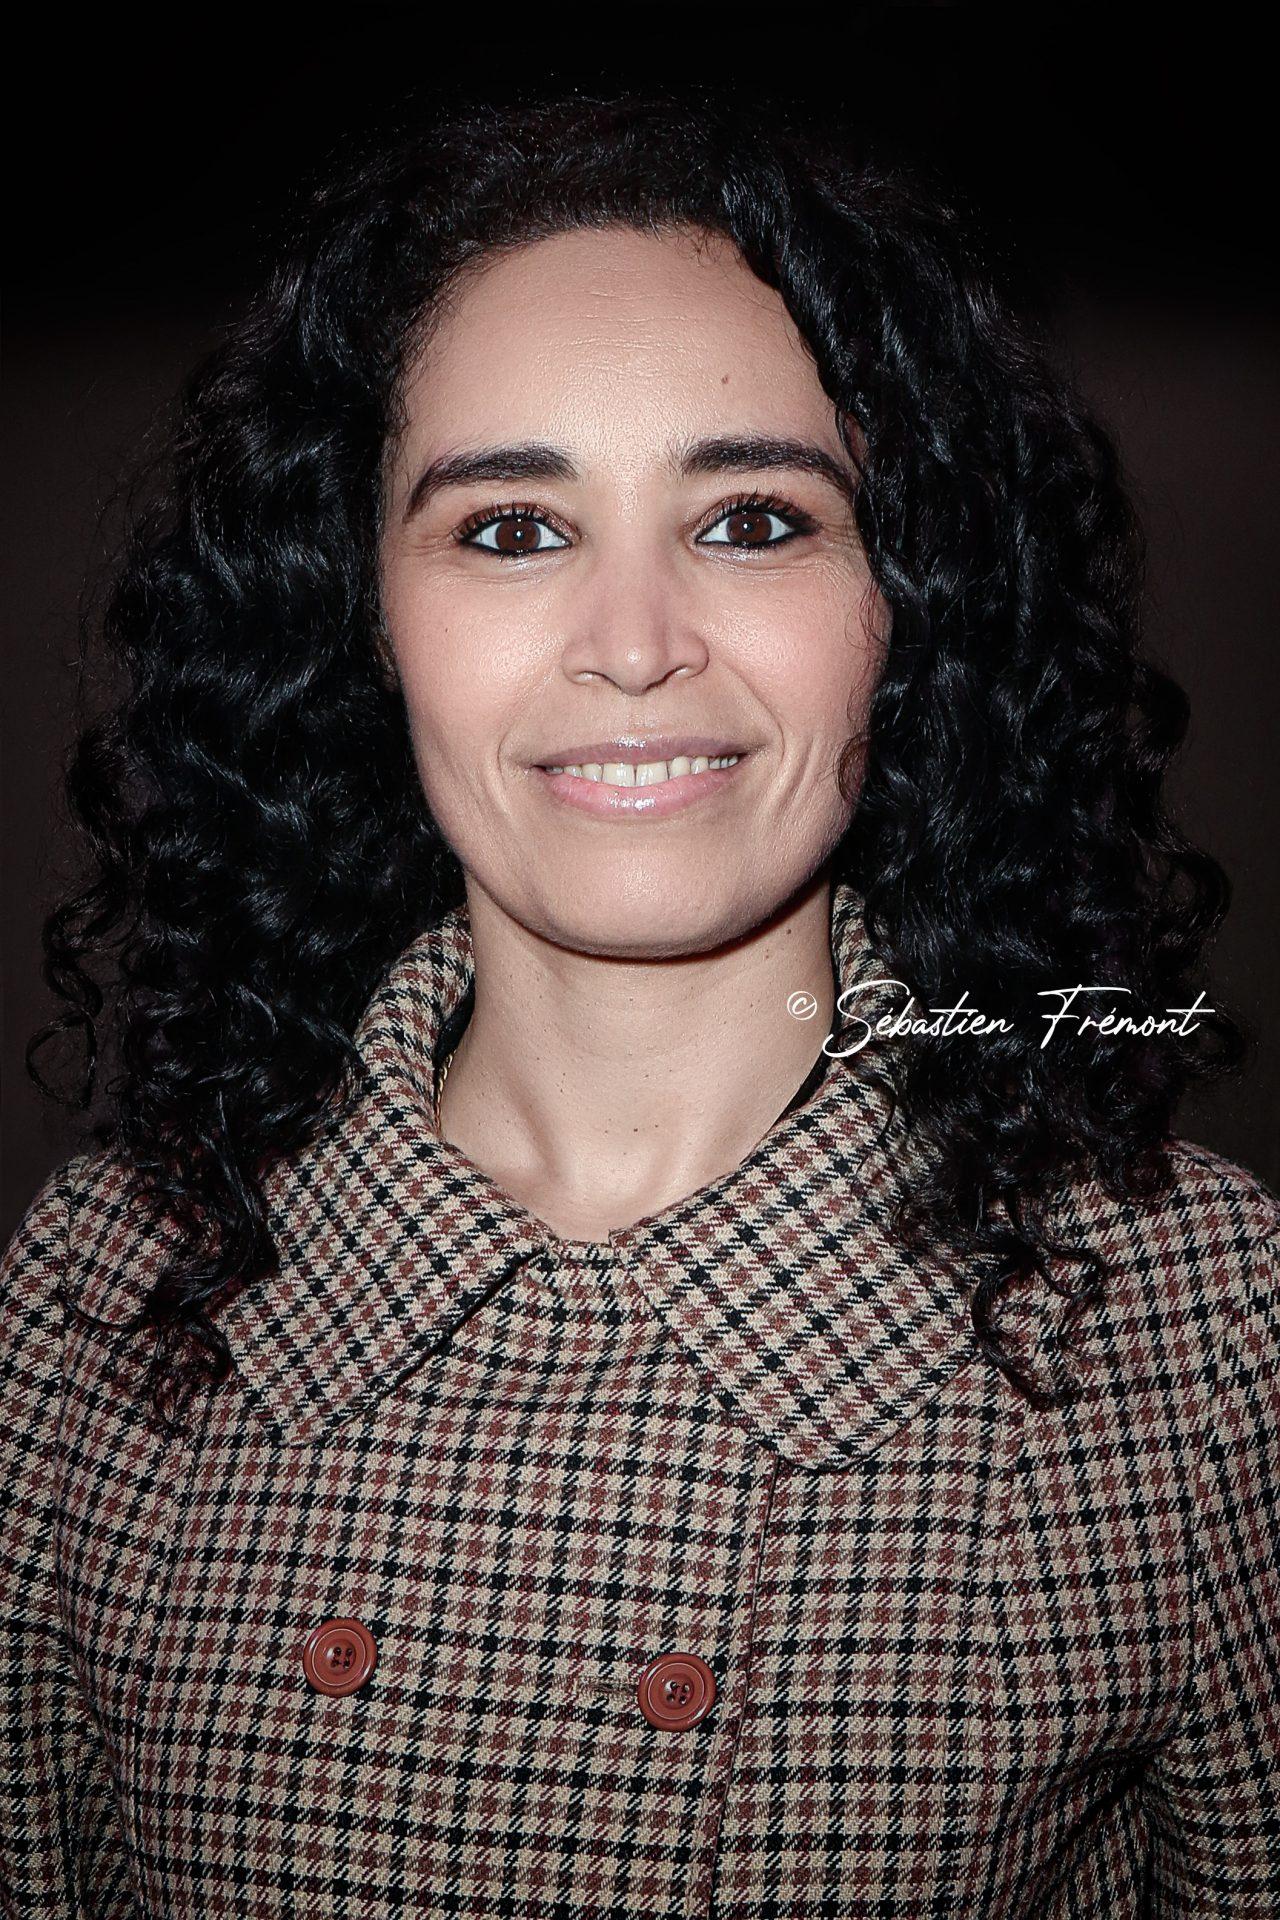 French Photographer Portrait Photography Aida Touihri / Alianna Liu